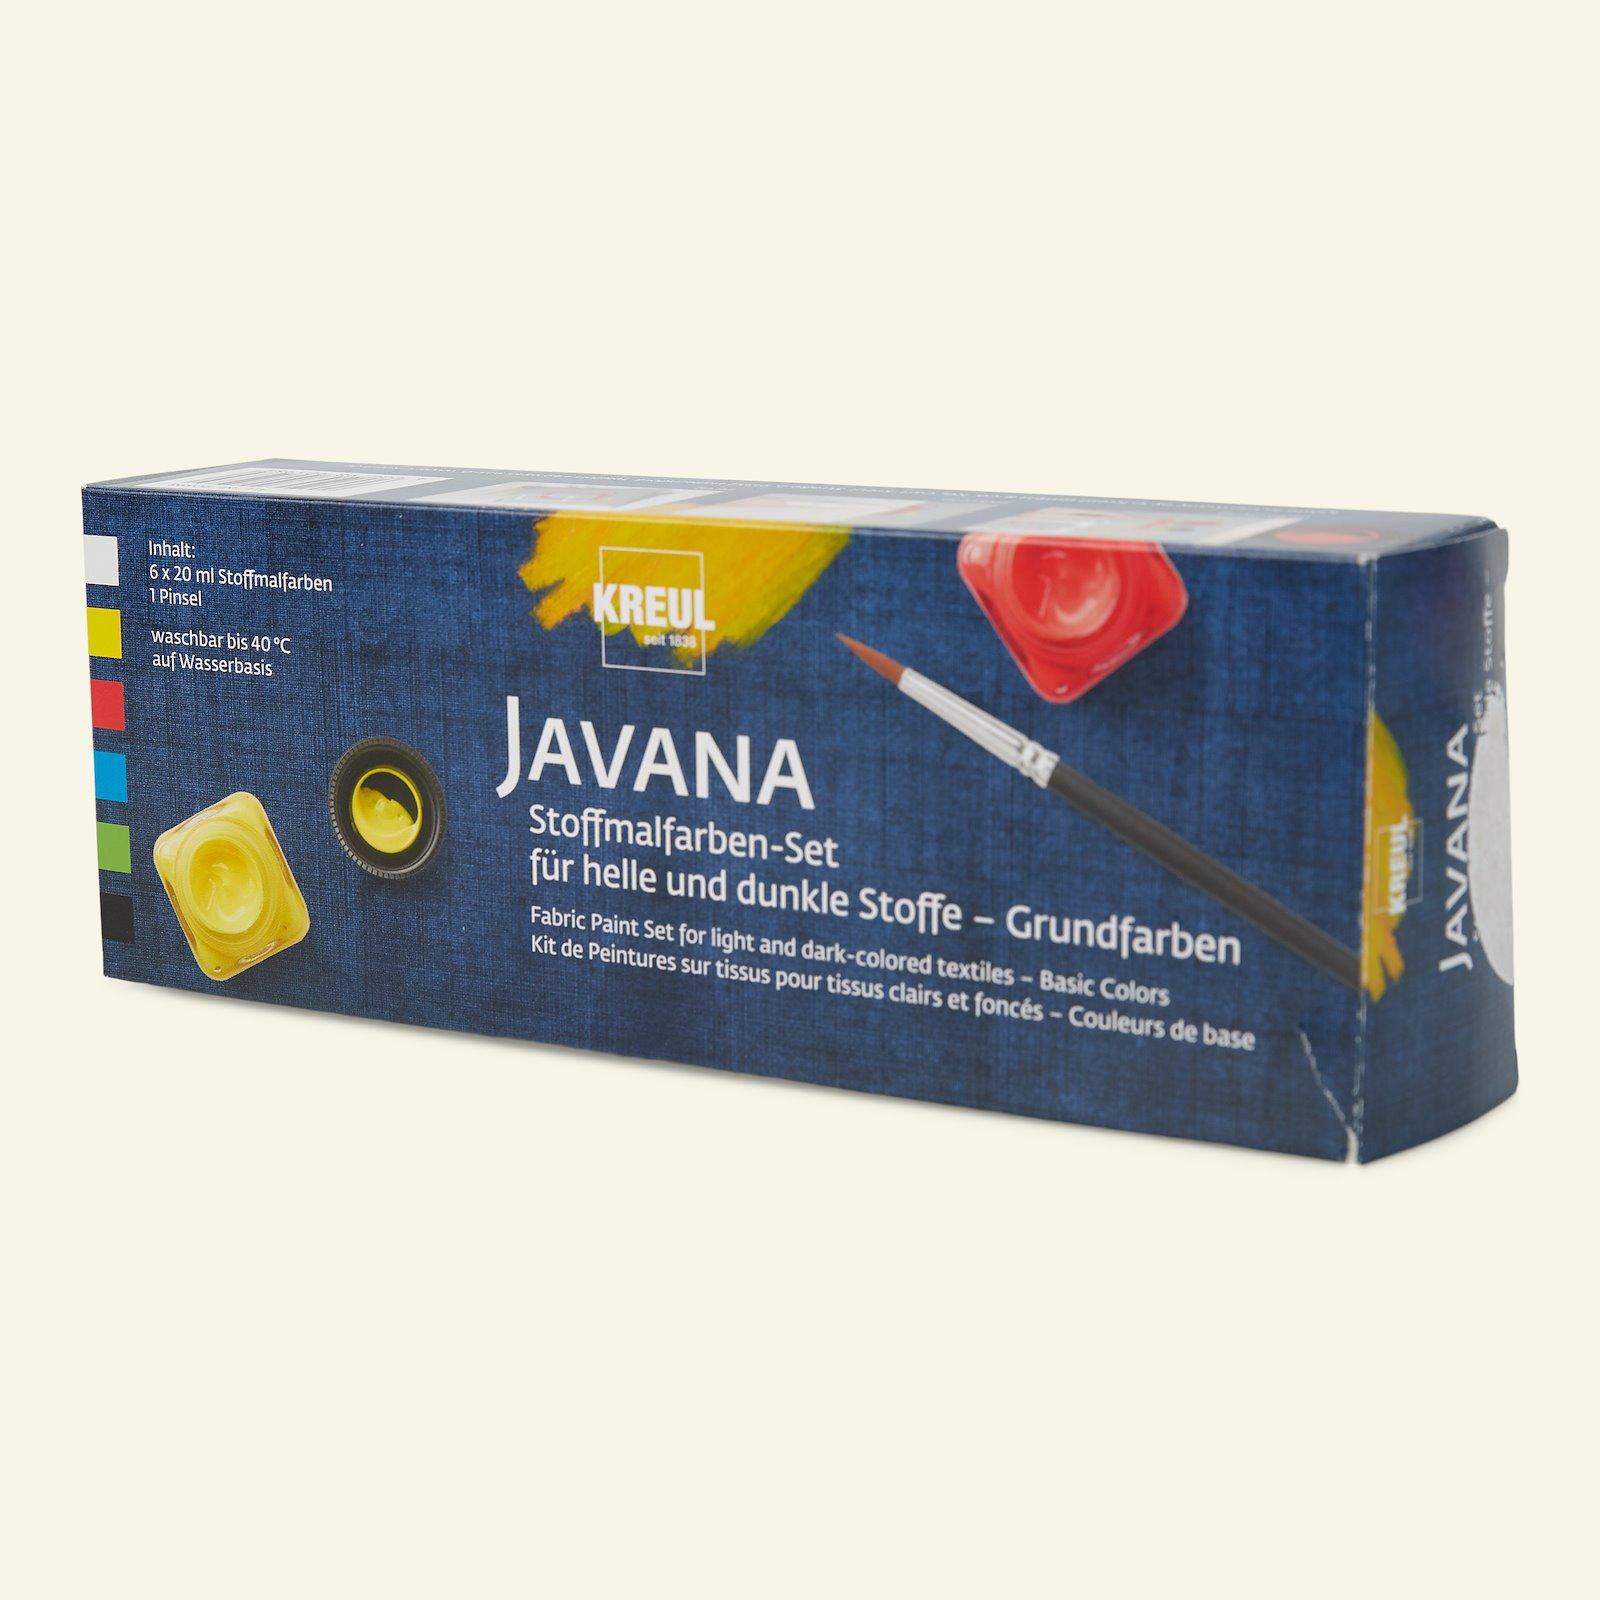 Javana opq fabric paints basic 6x20ml 29554_pack_c